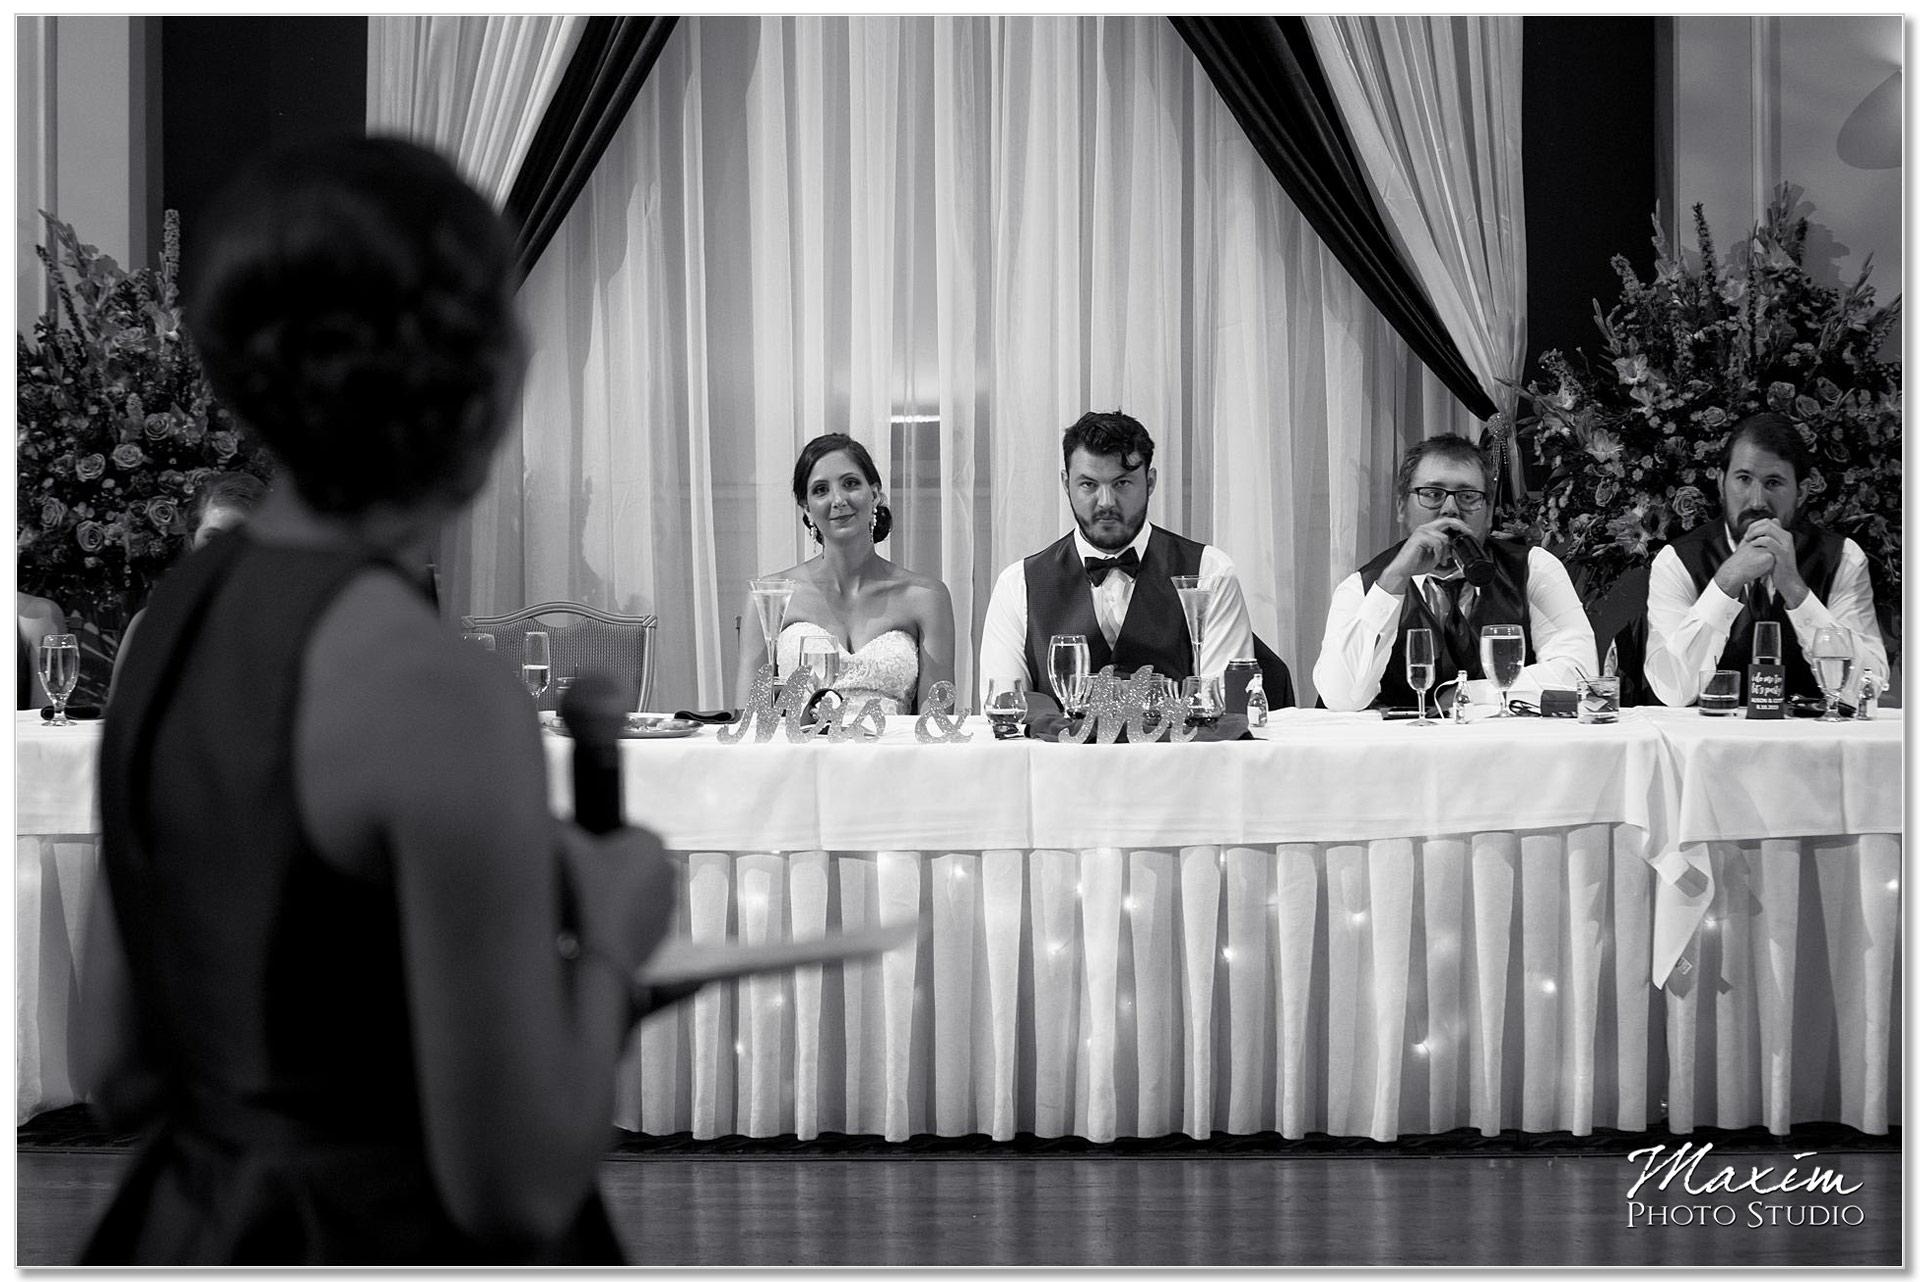 The Grand Wedding Reception toasts